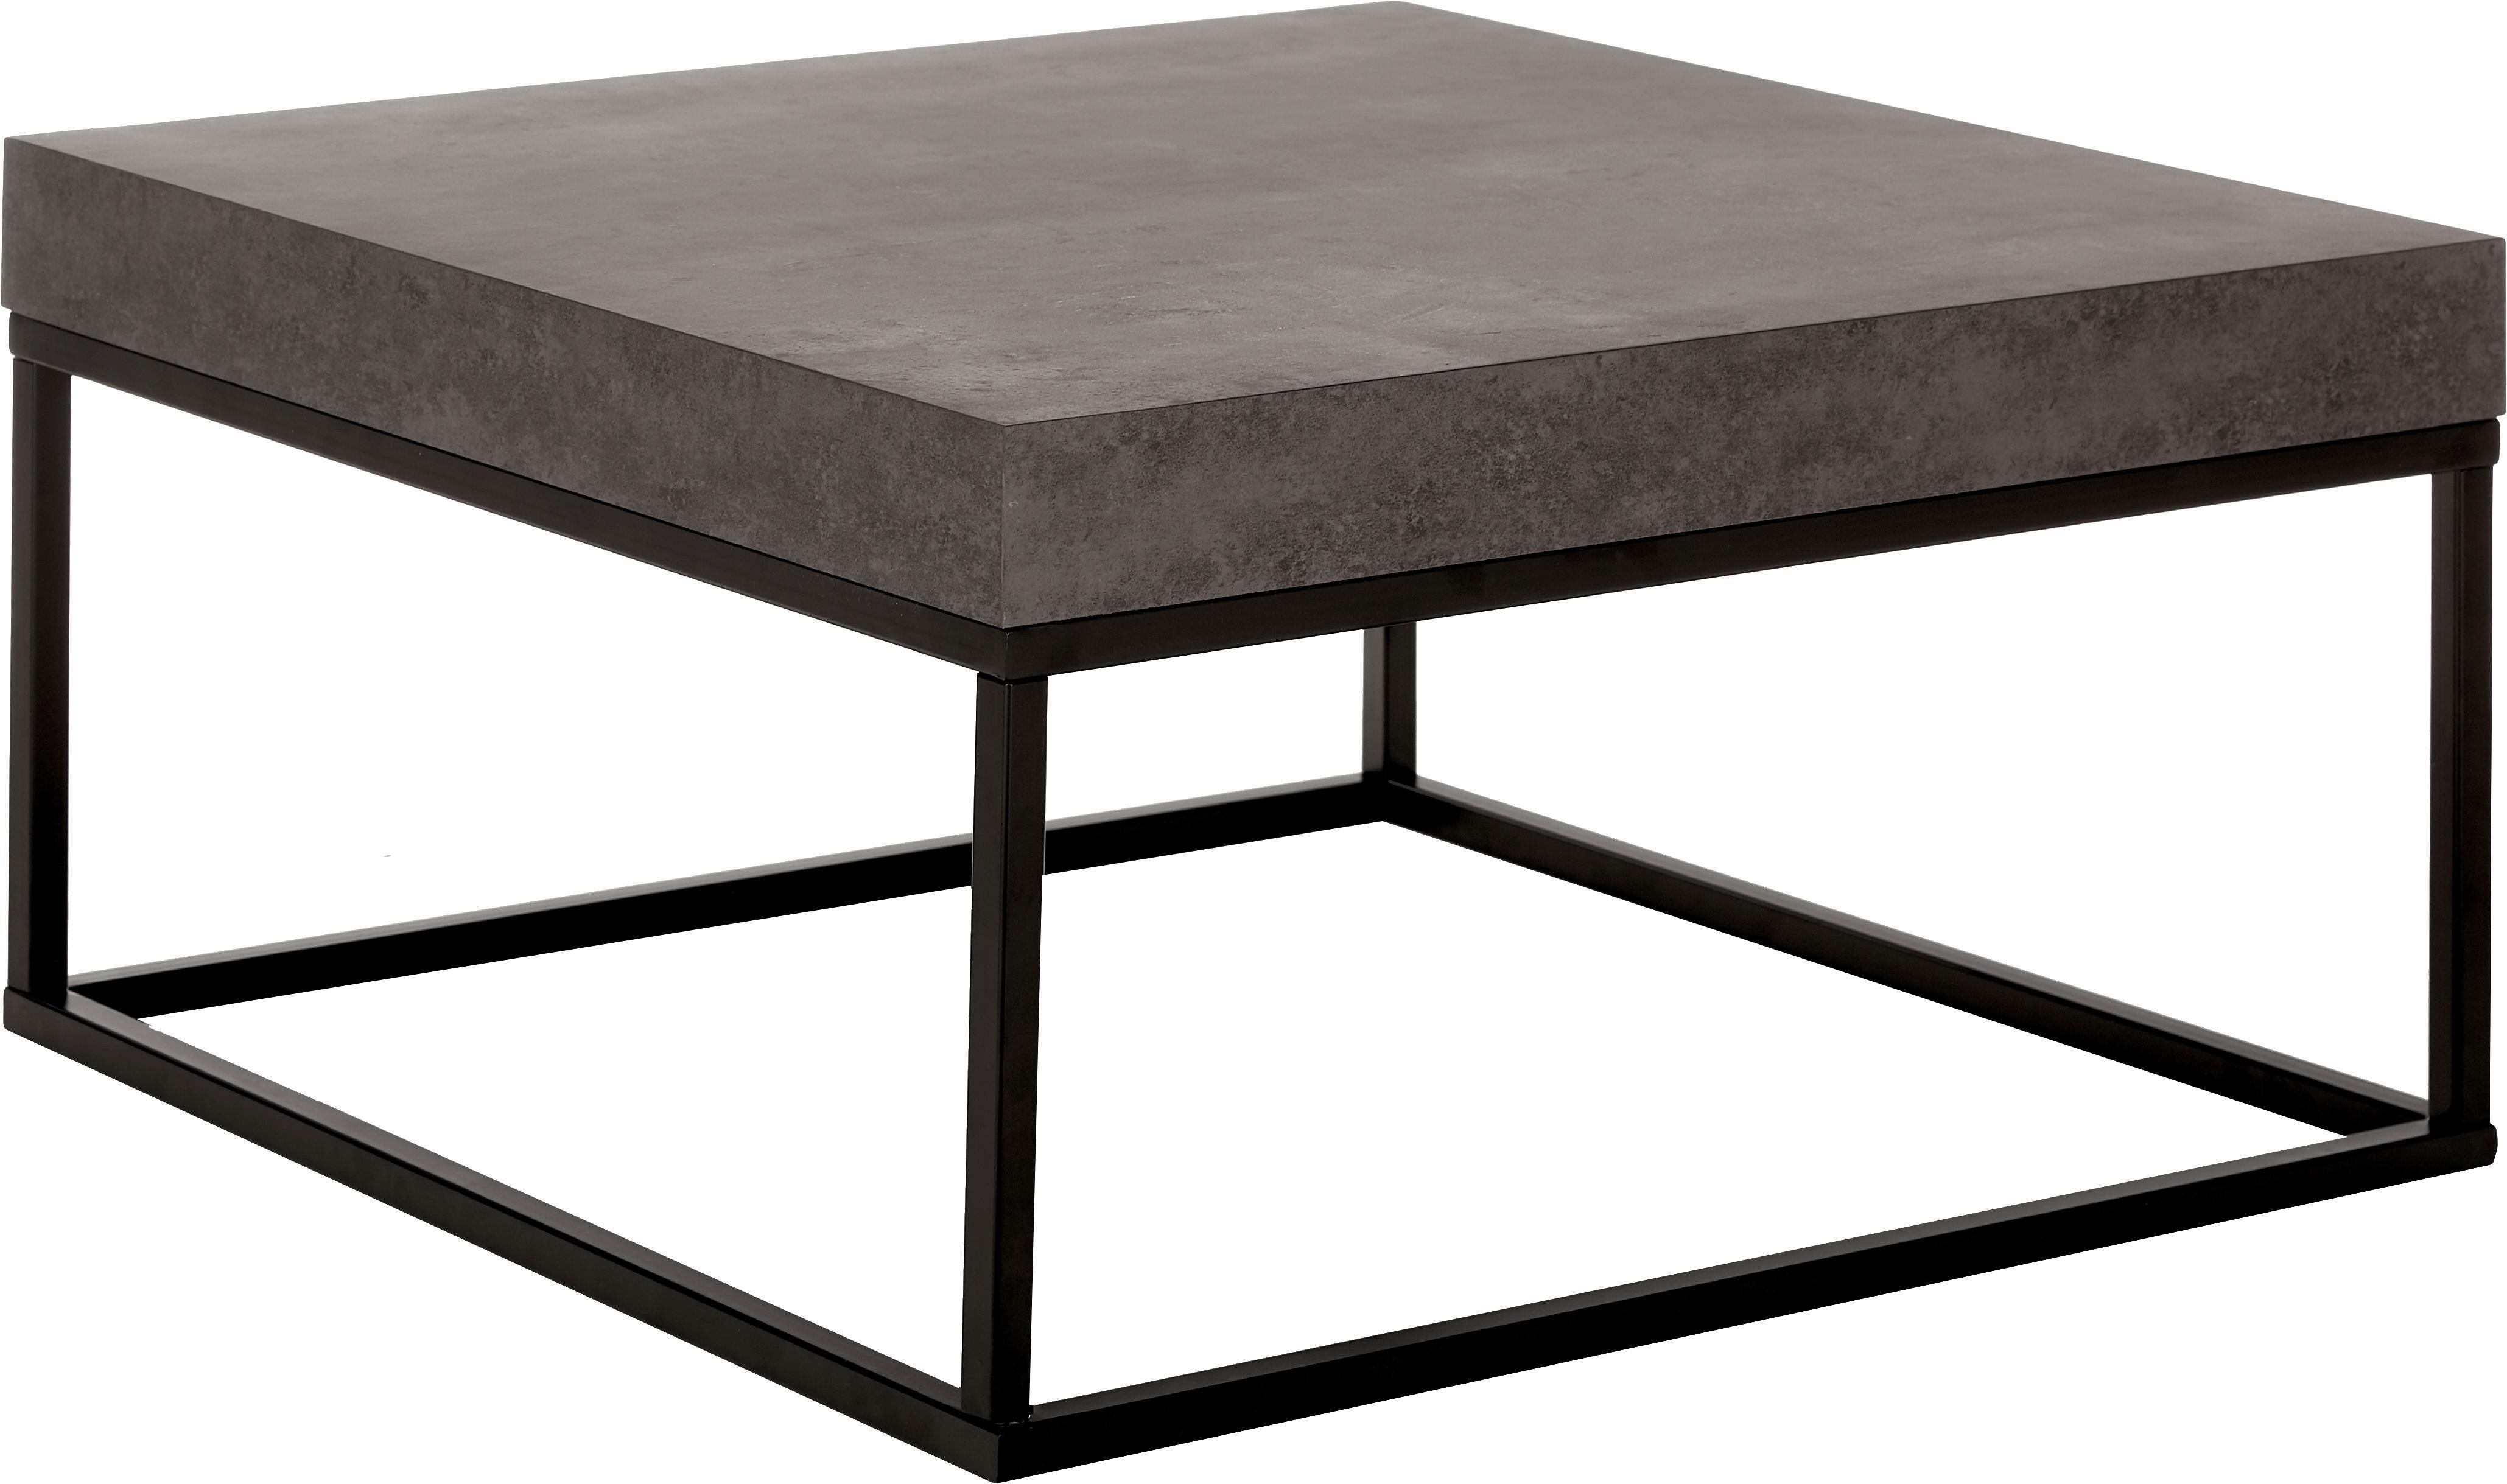 Mesa de centro en cemento Ellis, Tablero: estructura ligera de pana, Estructura: metal pintado, Negro, imitación de cemento, An 75 x Al 38 cm